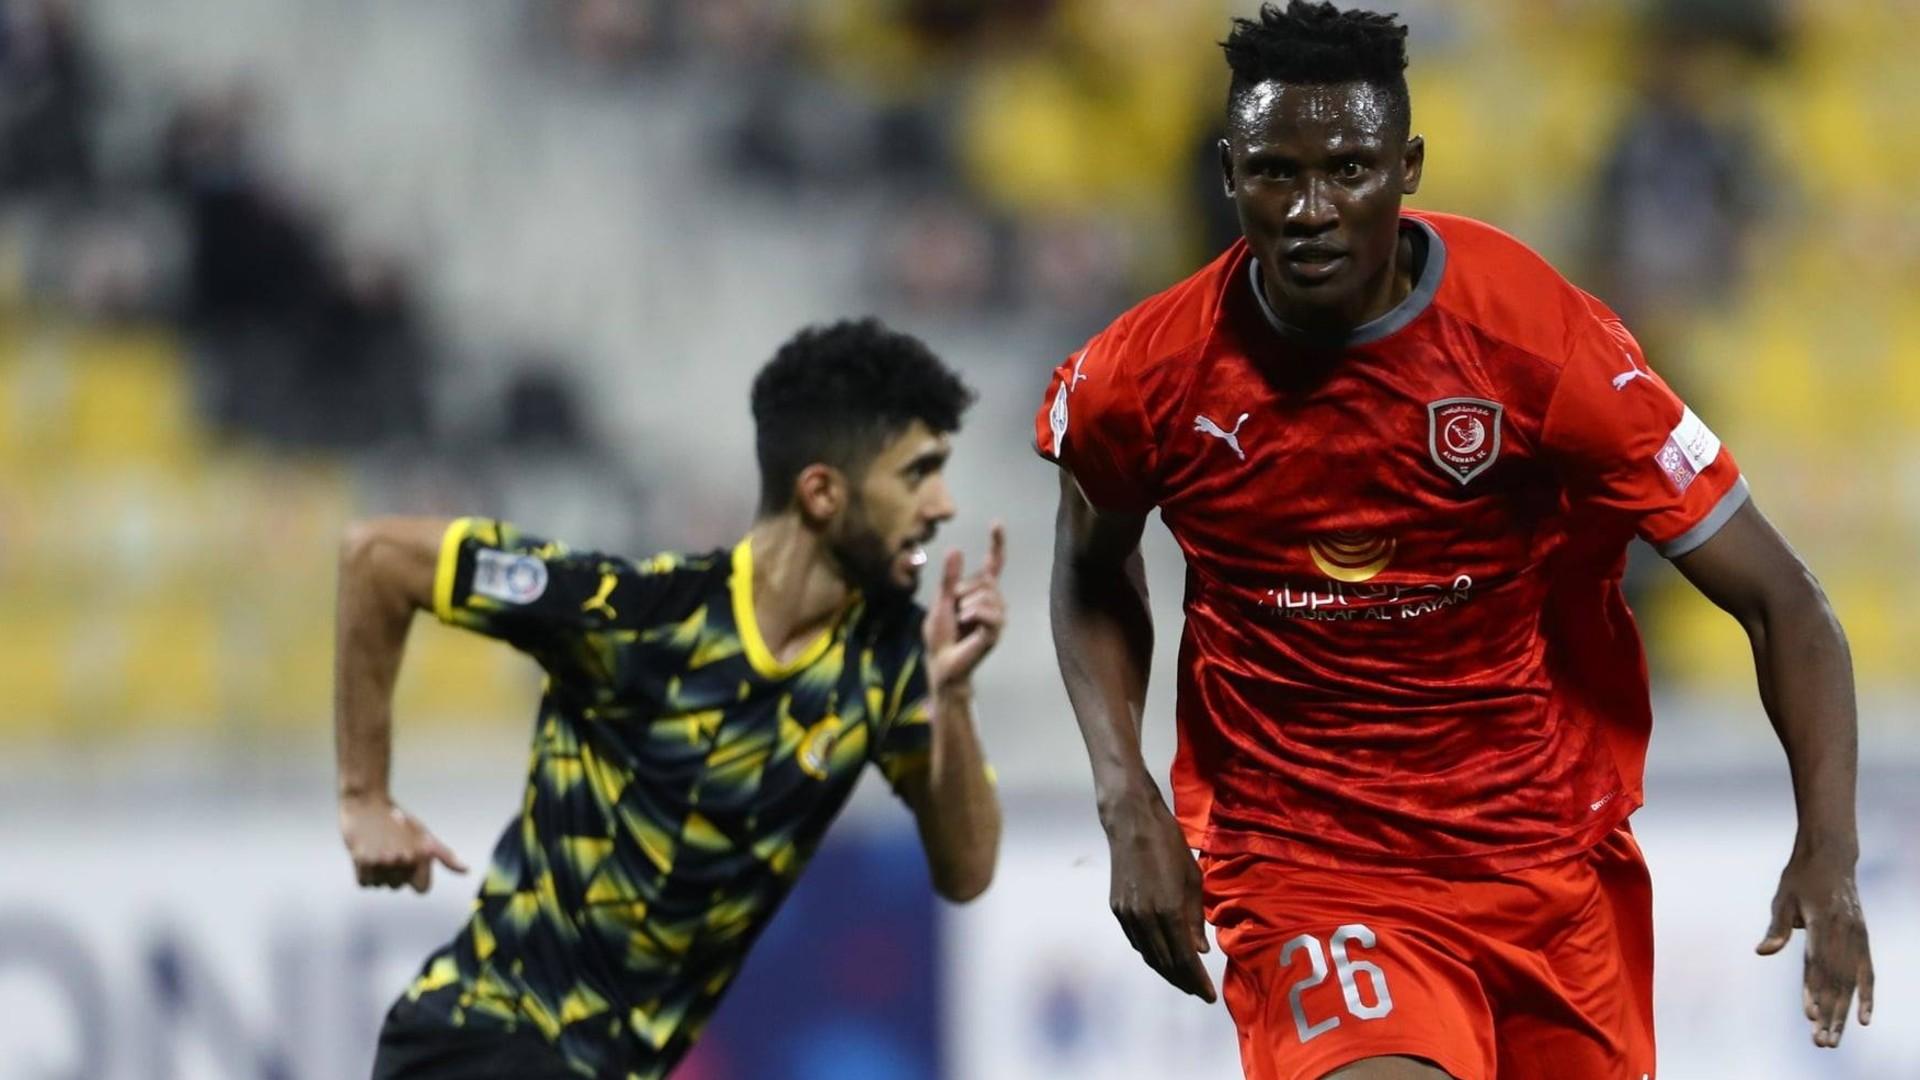 Fifa Club World Cup: 'Al Ahly, Bayern Munich will be difficult for Olunga's Al-Duhail' - Ali